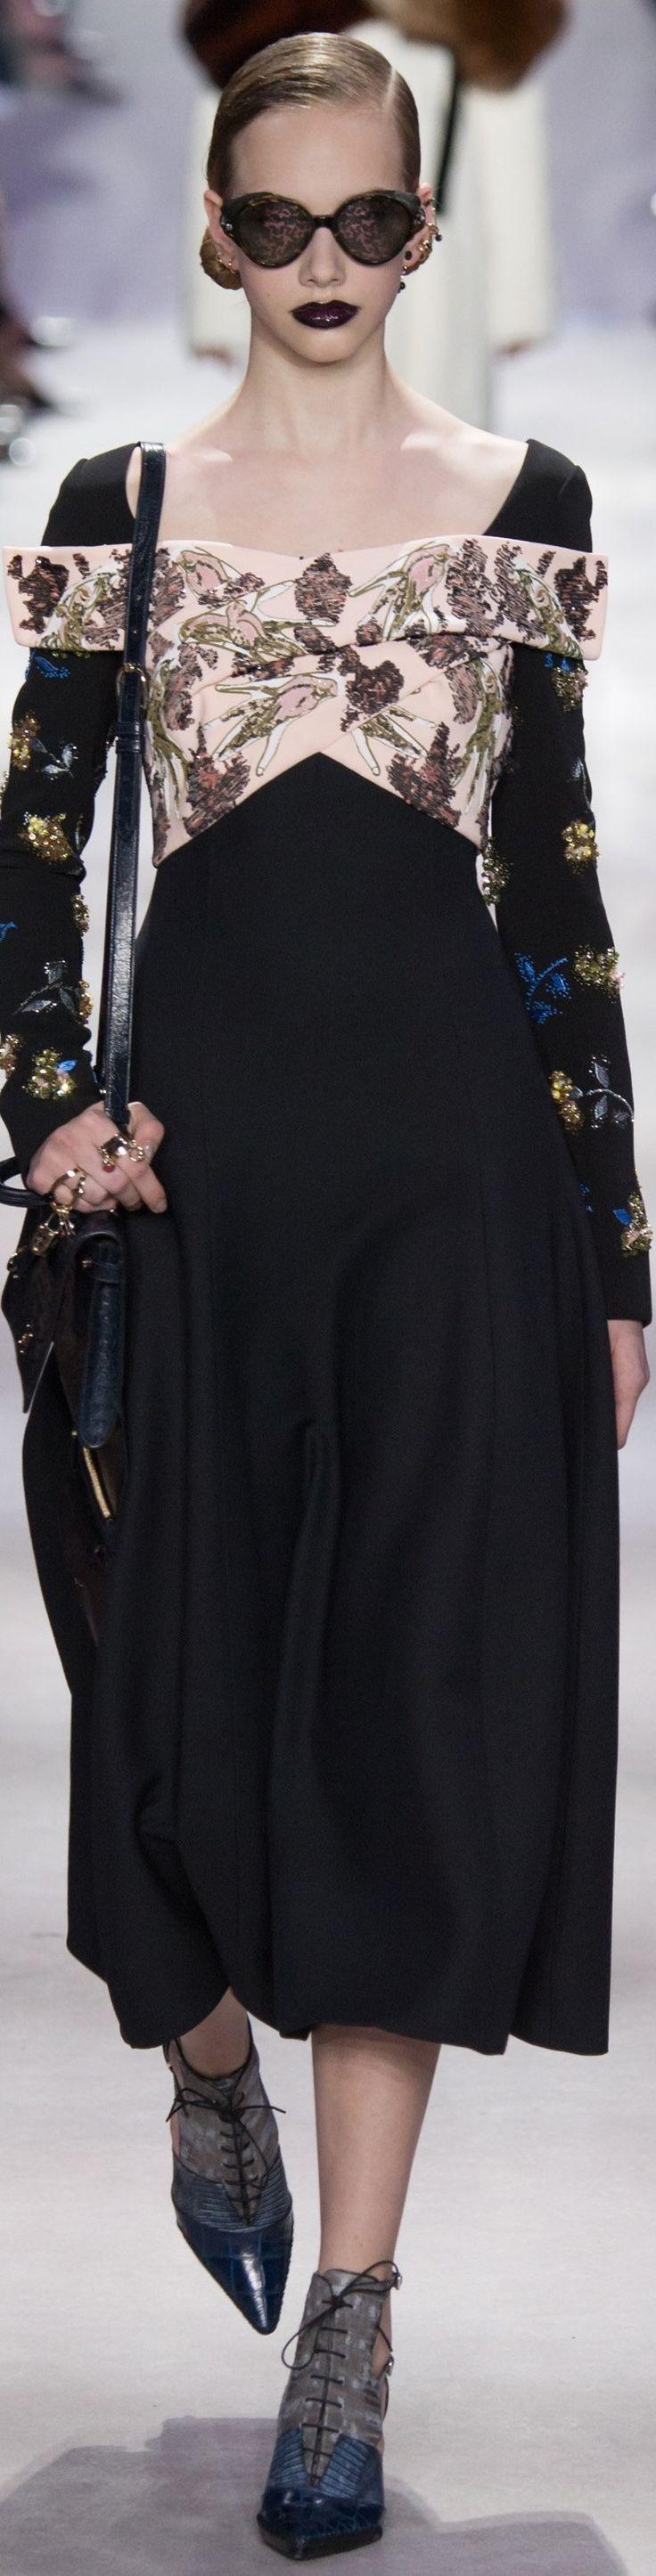 Christian Dior fall 2016 RTW